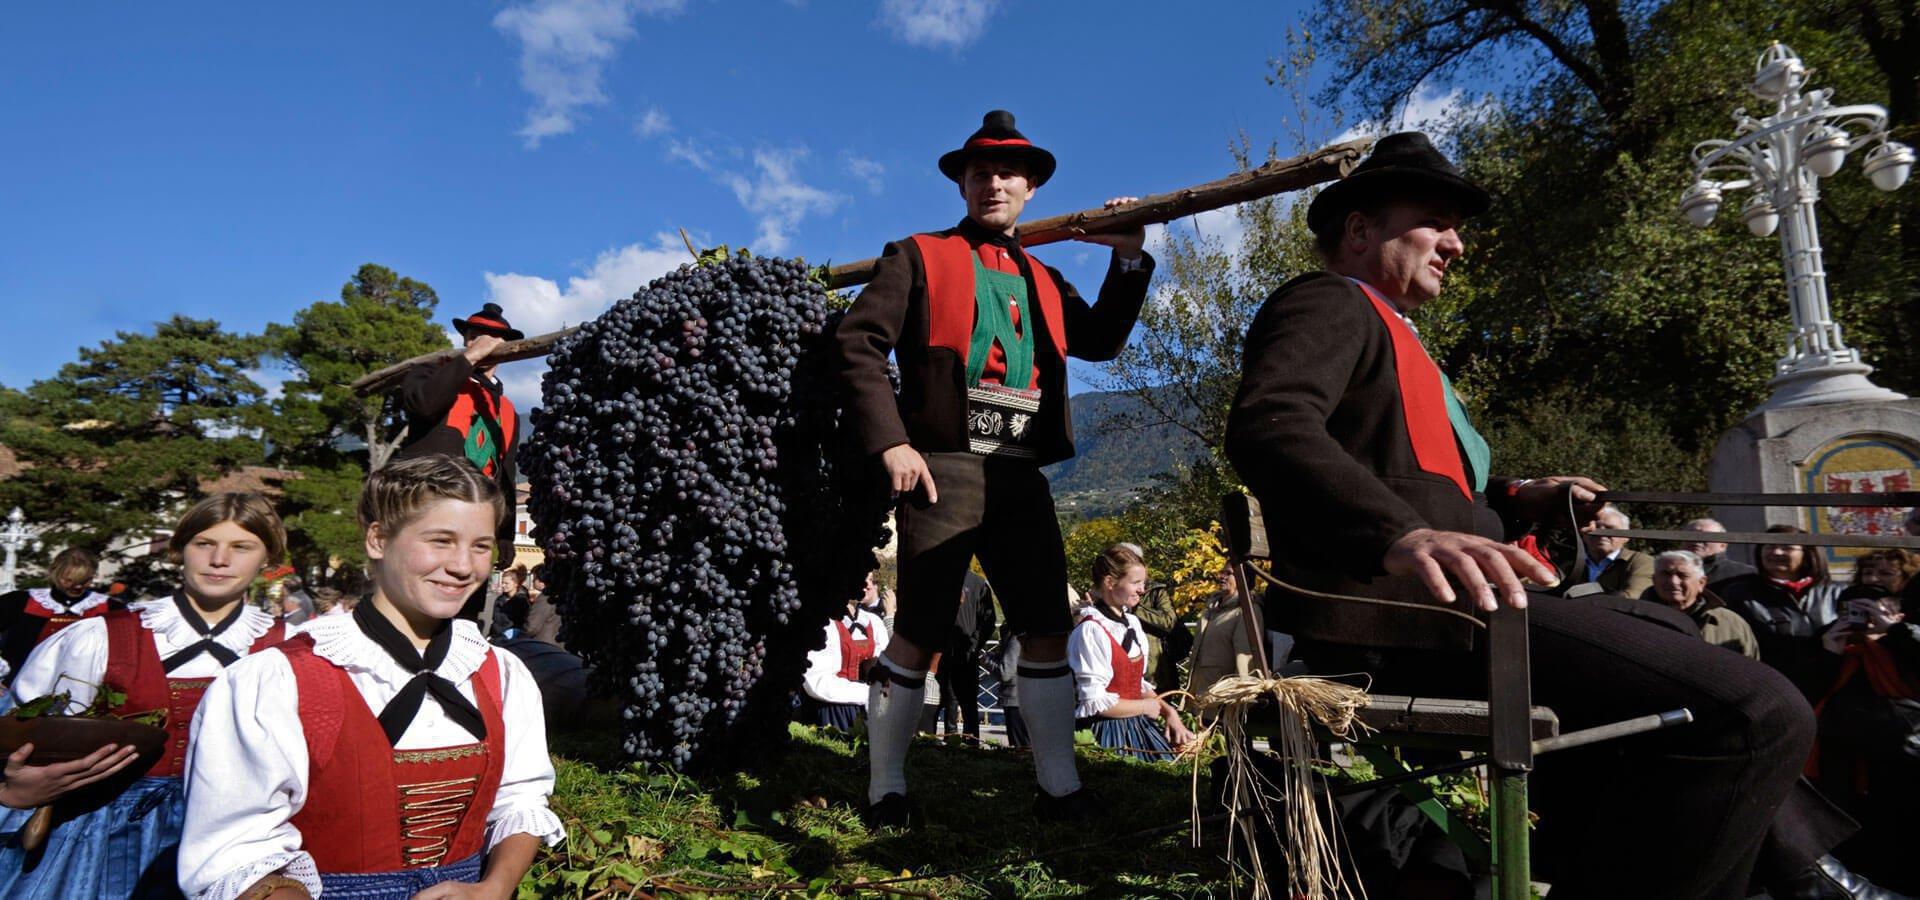 urlaub-im-meraner-land-tradition-suedtirol